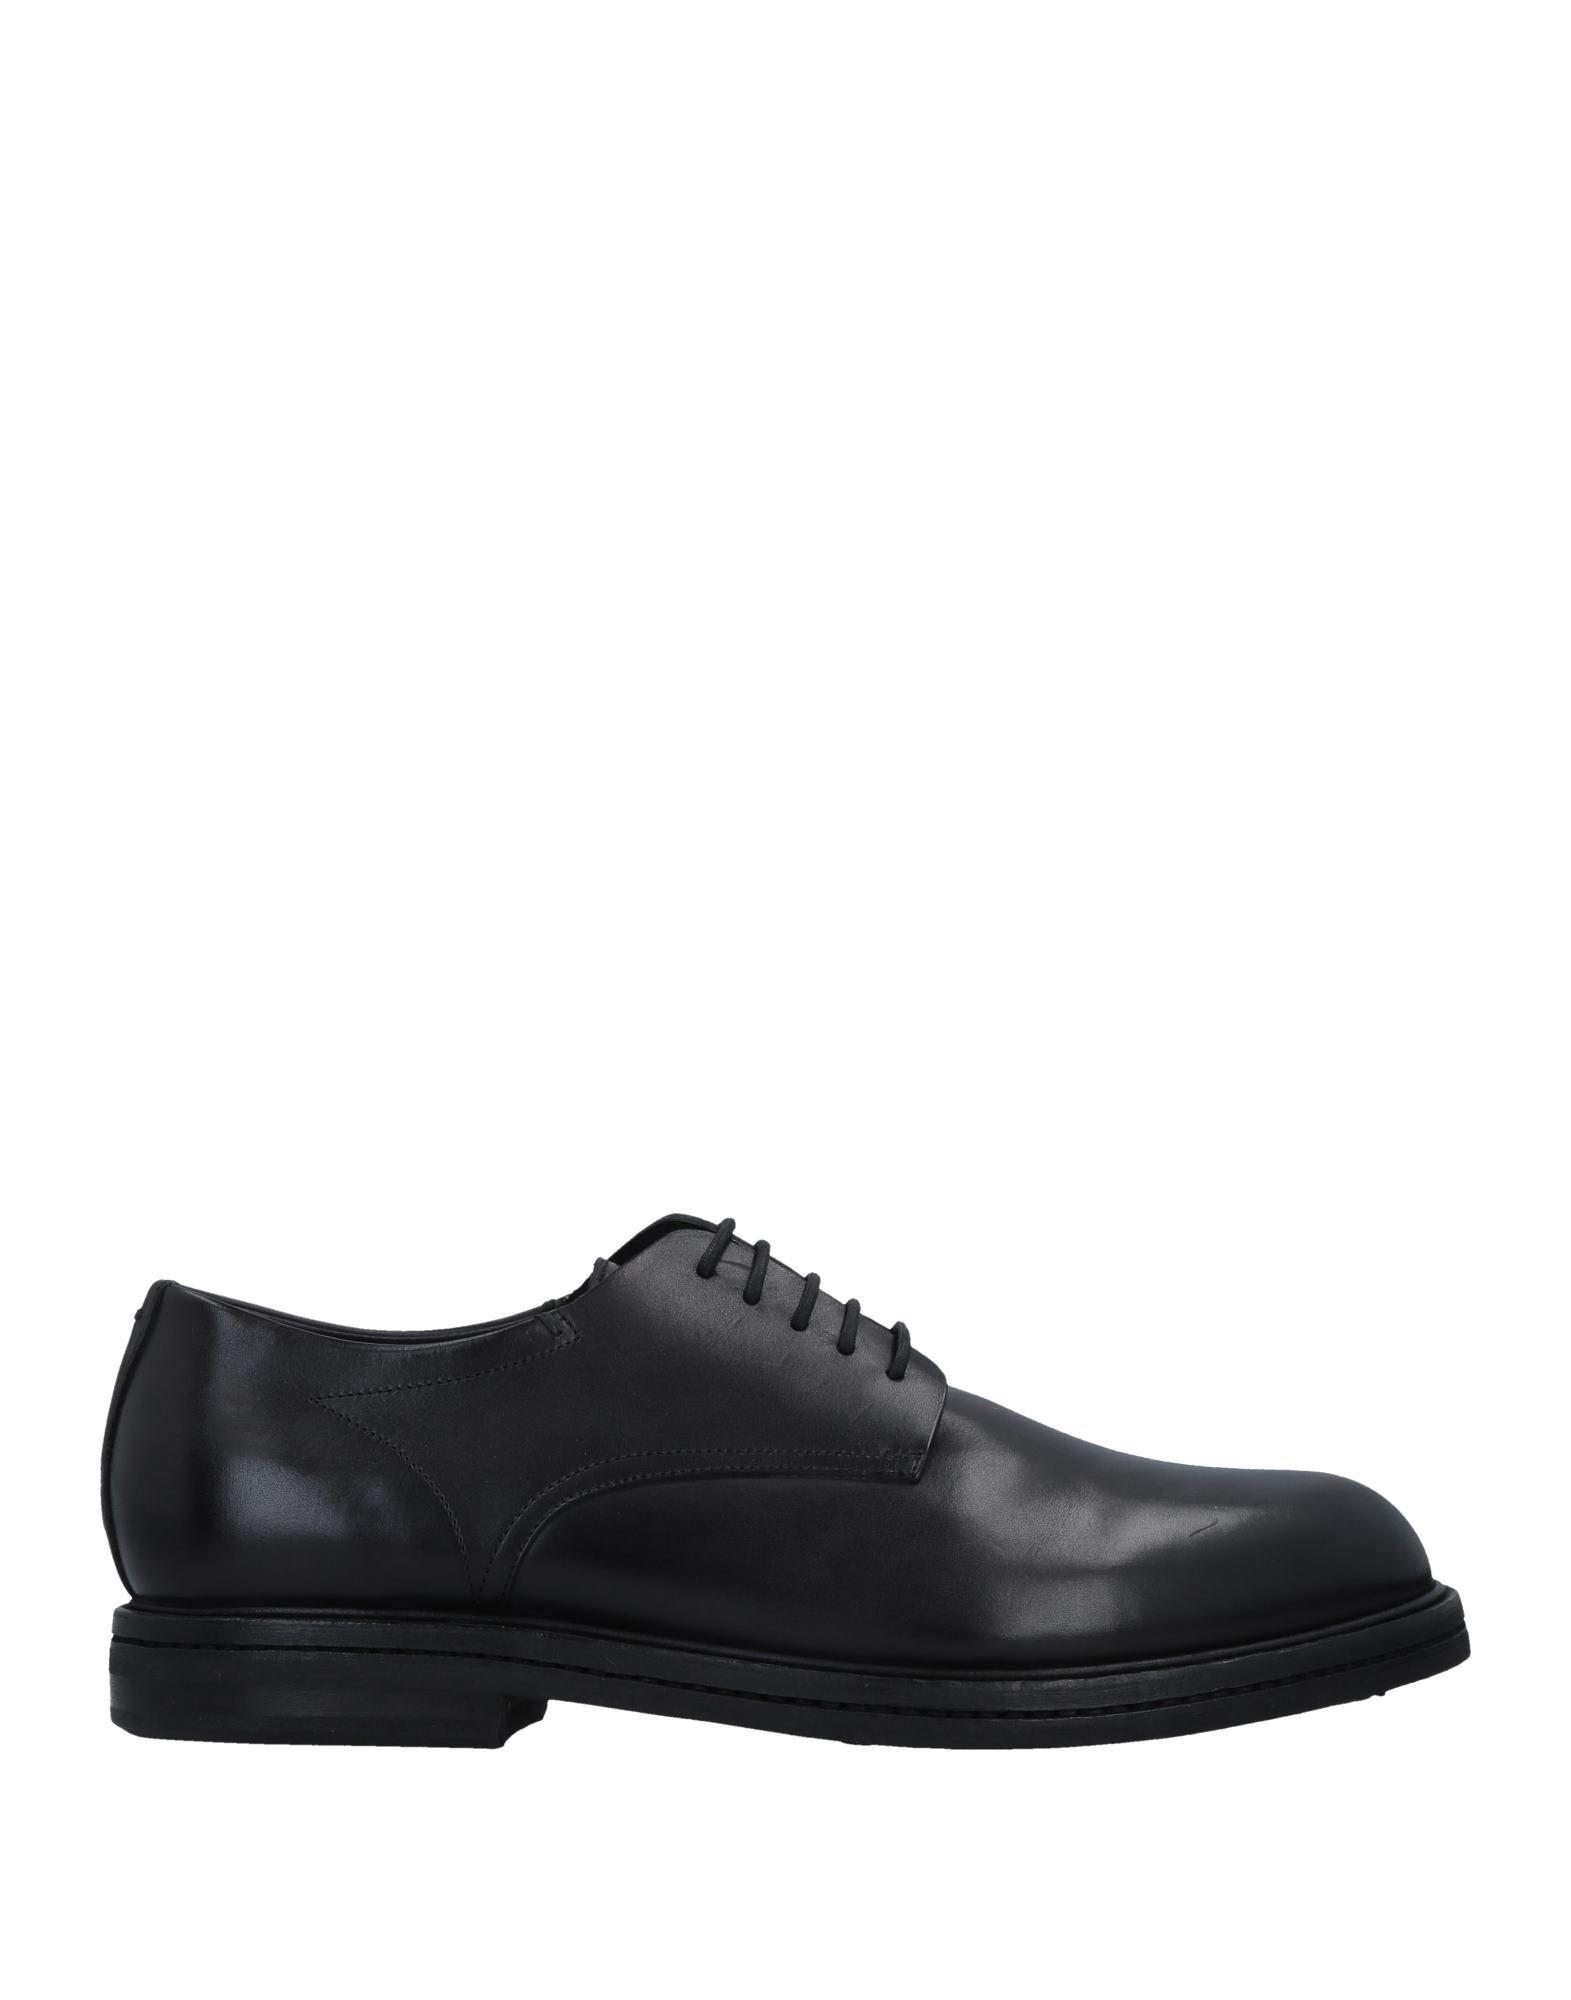 PANTANETTI Обувь на шнурках первый внутри обувь обувь обувь обувь обувь обувь обувь обувь обувь 8a2549 мужская армия green 40 метров